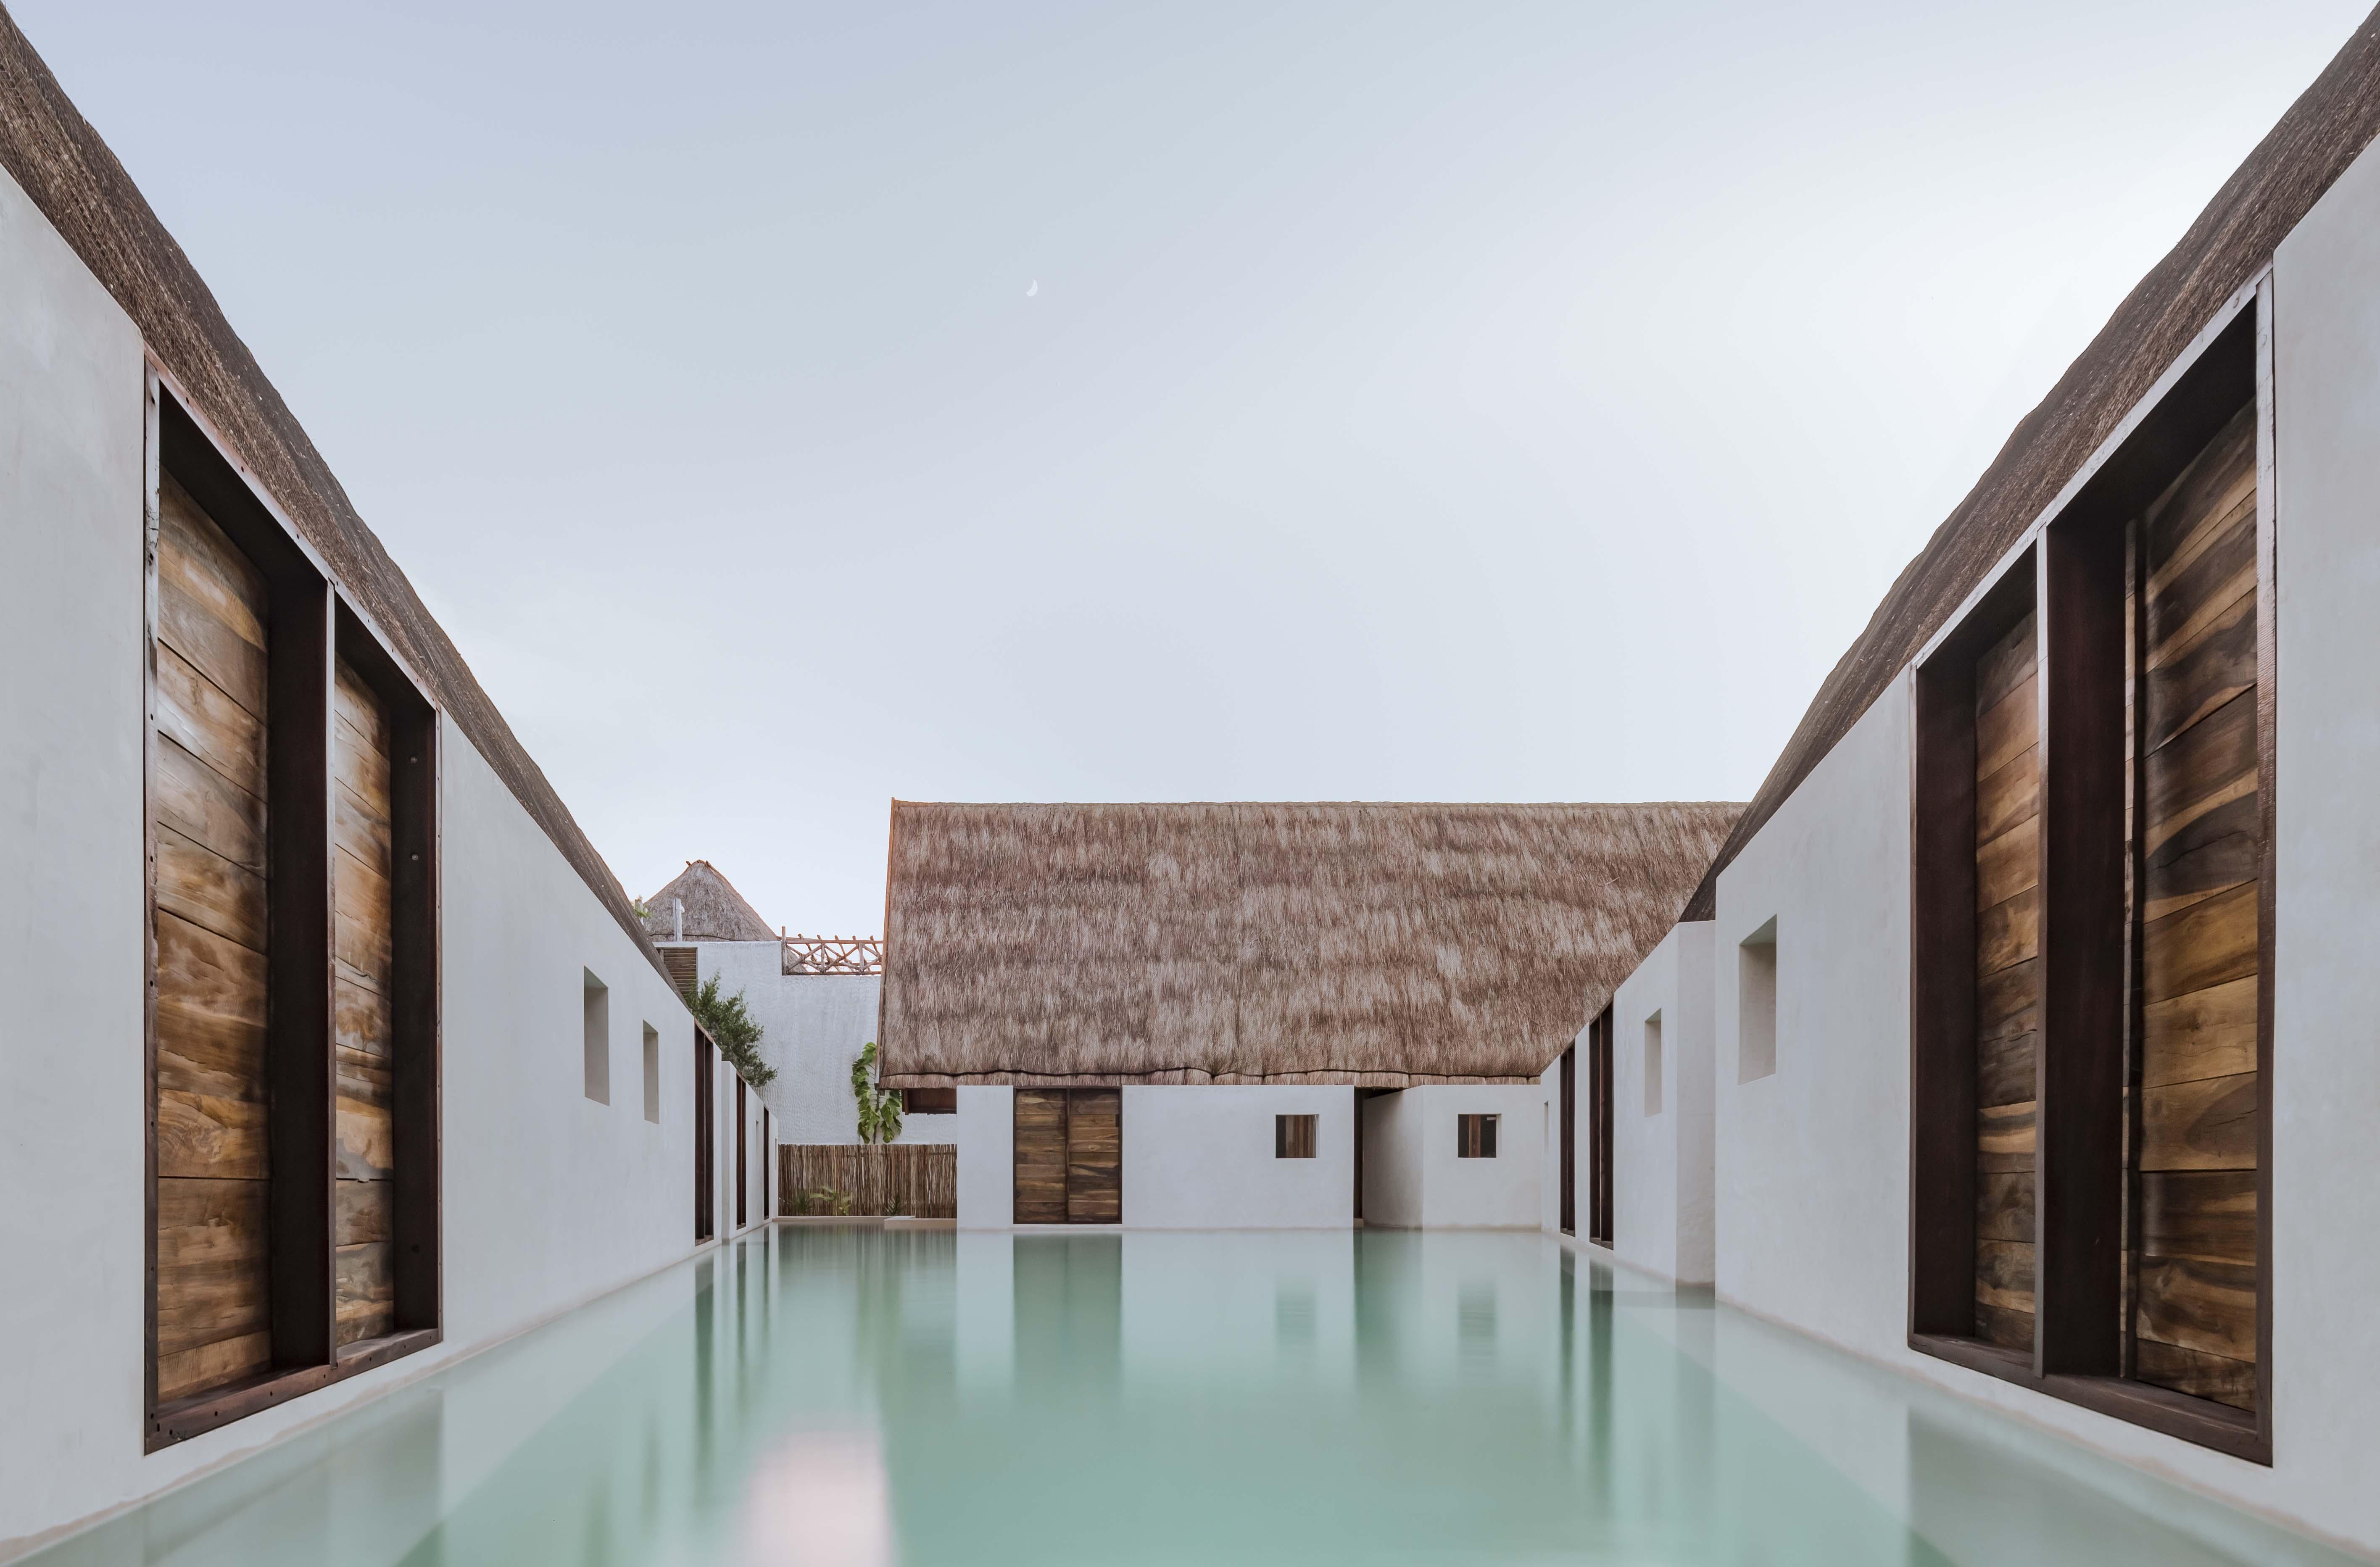 Punta Caliza Hotel designed by Macías Peredo Arquitectos